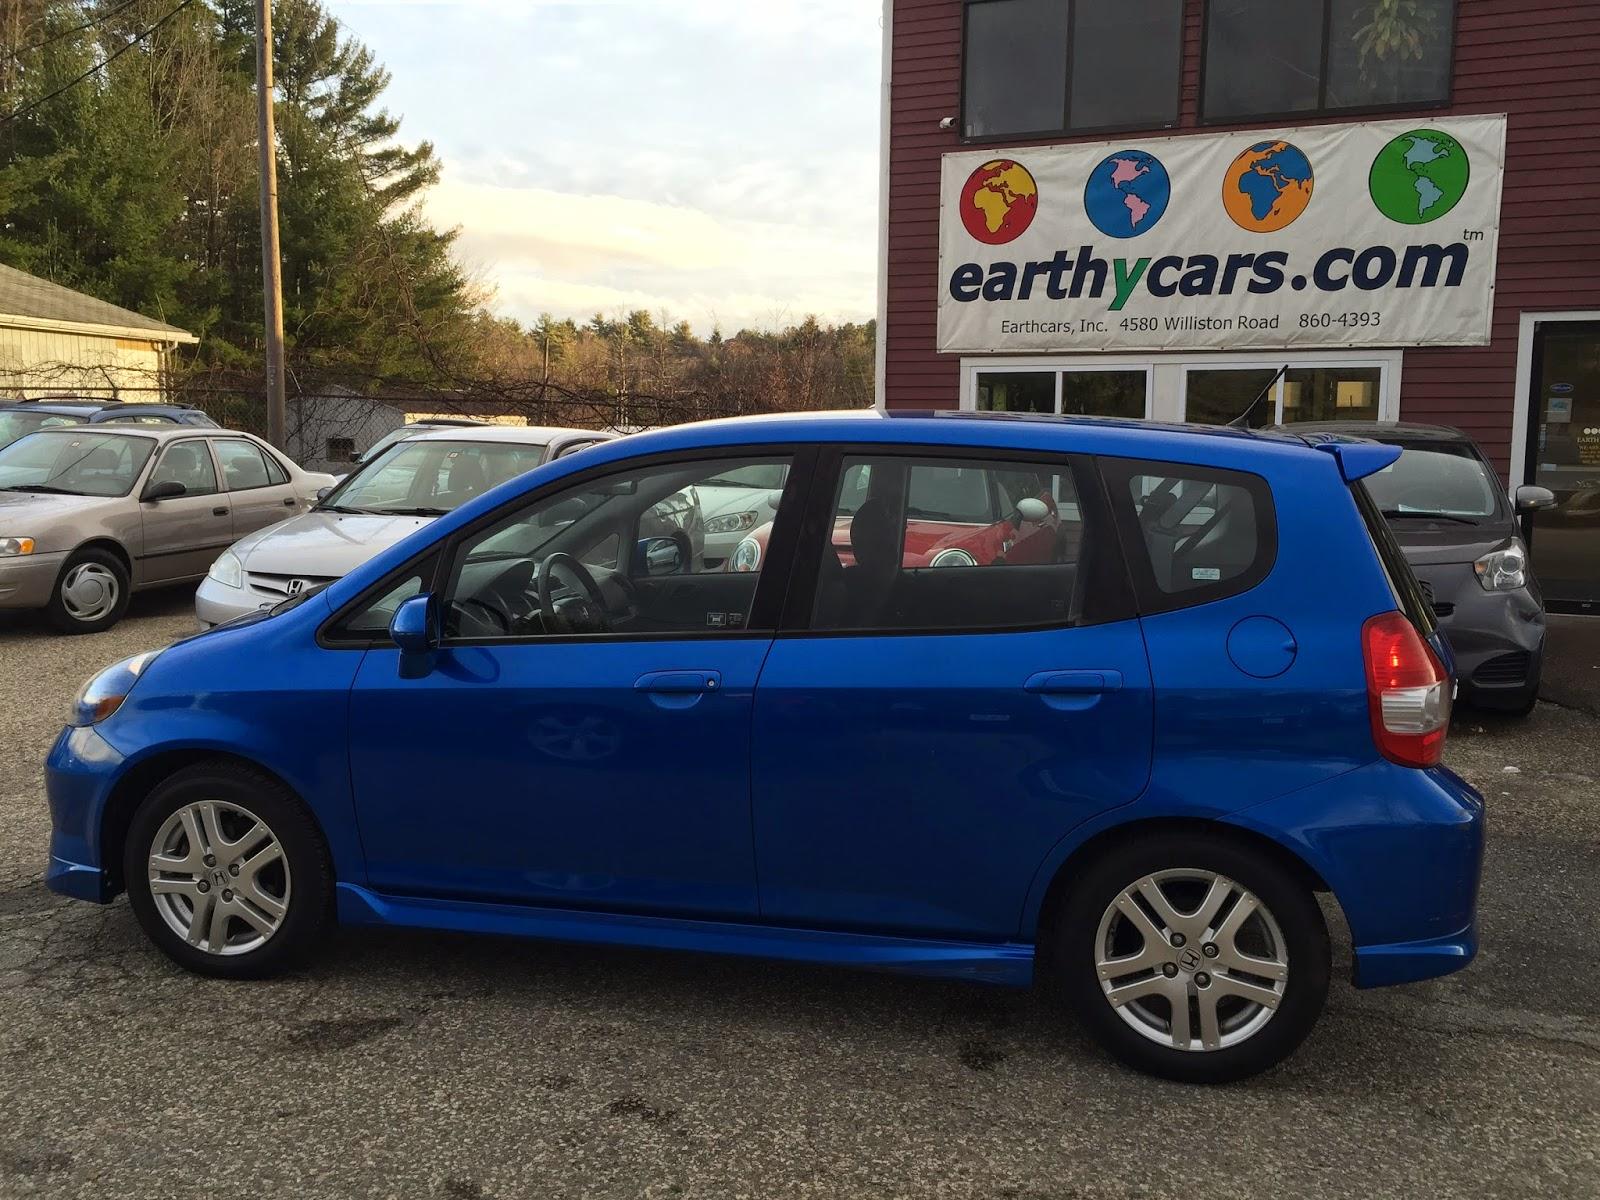 Earthy Cars Blog February 2015